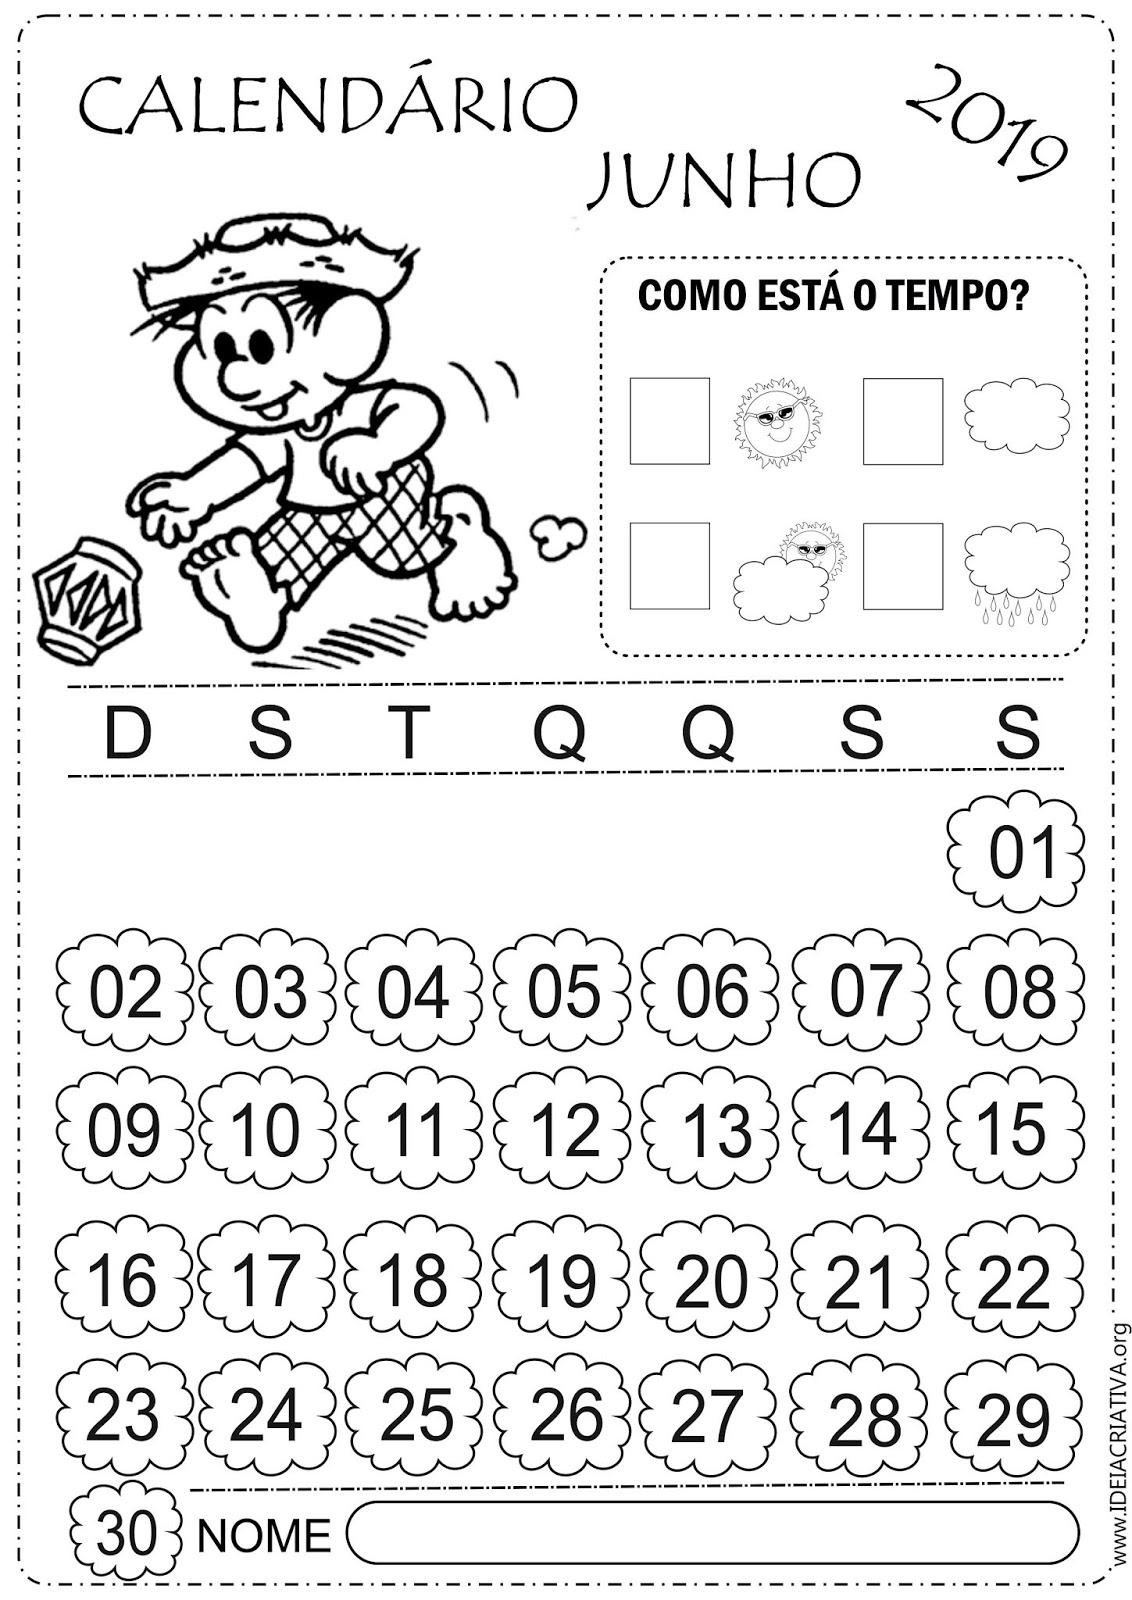 Calendarios Junho 2019 Turma Da Monica Para Colorir E Imprimir